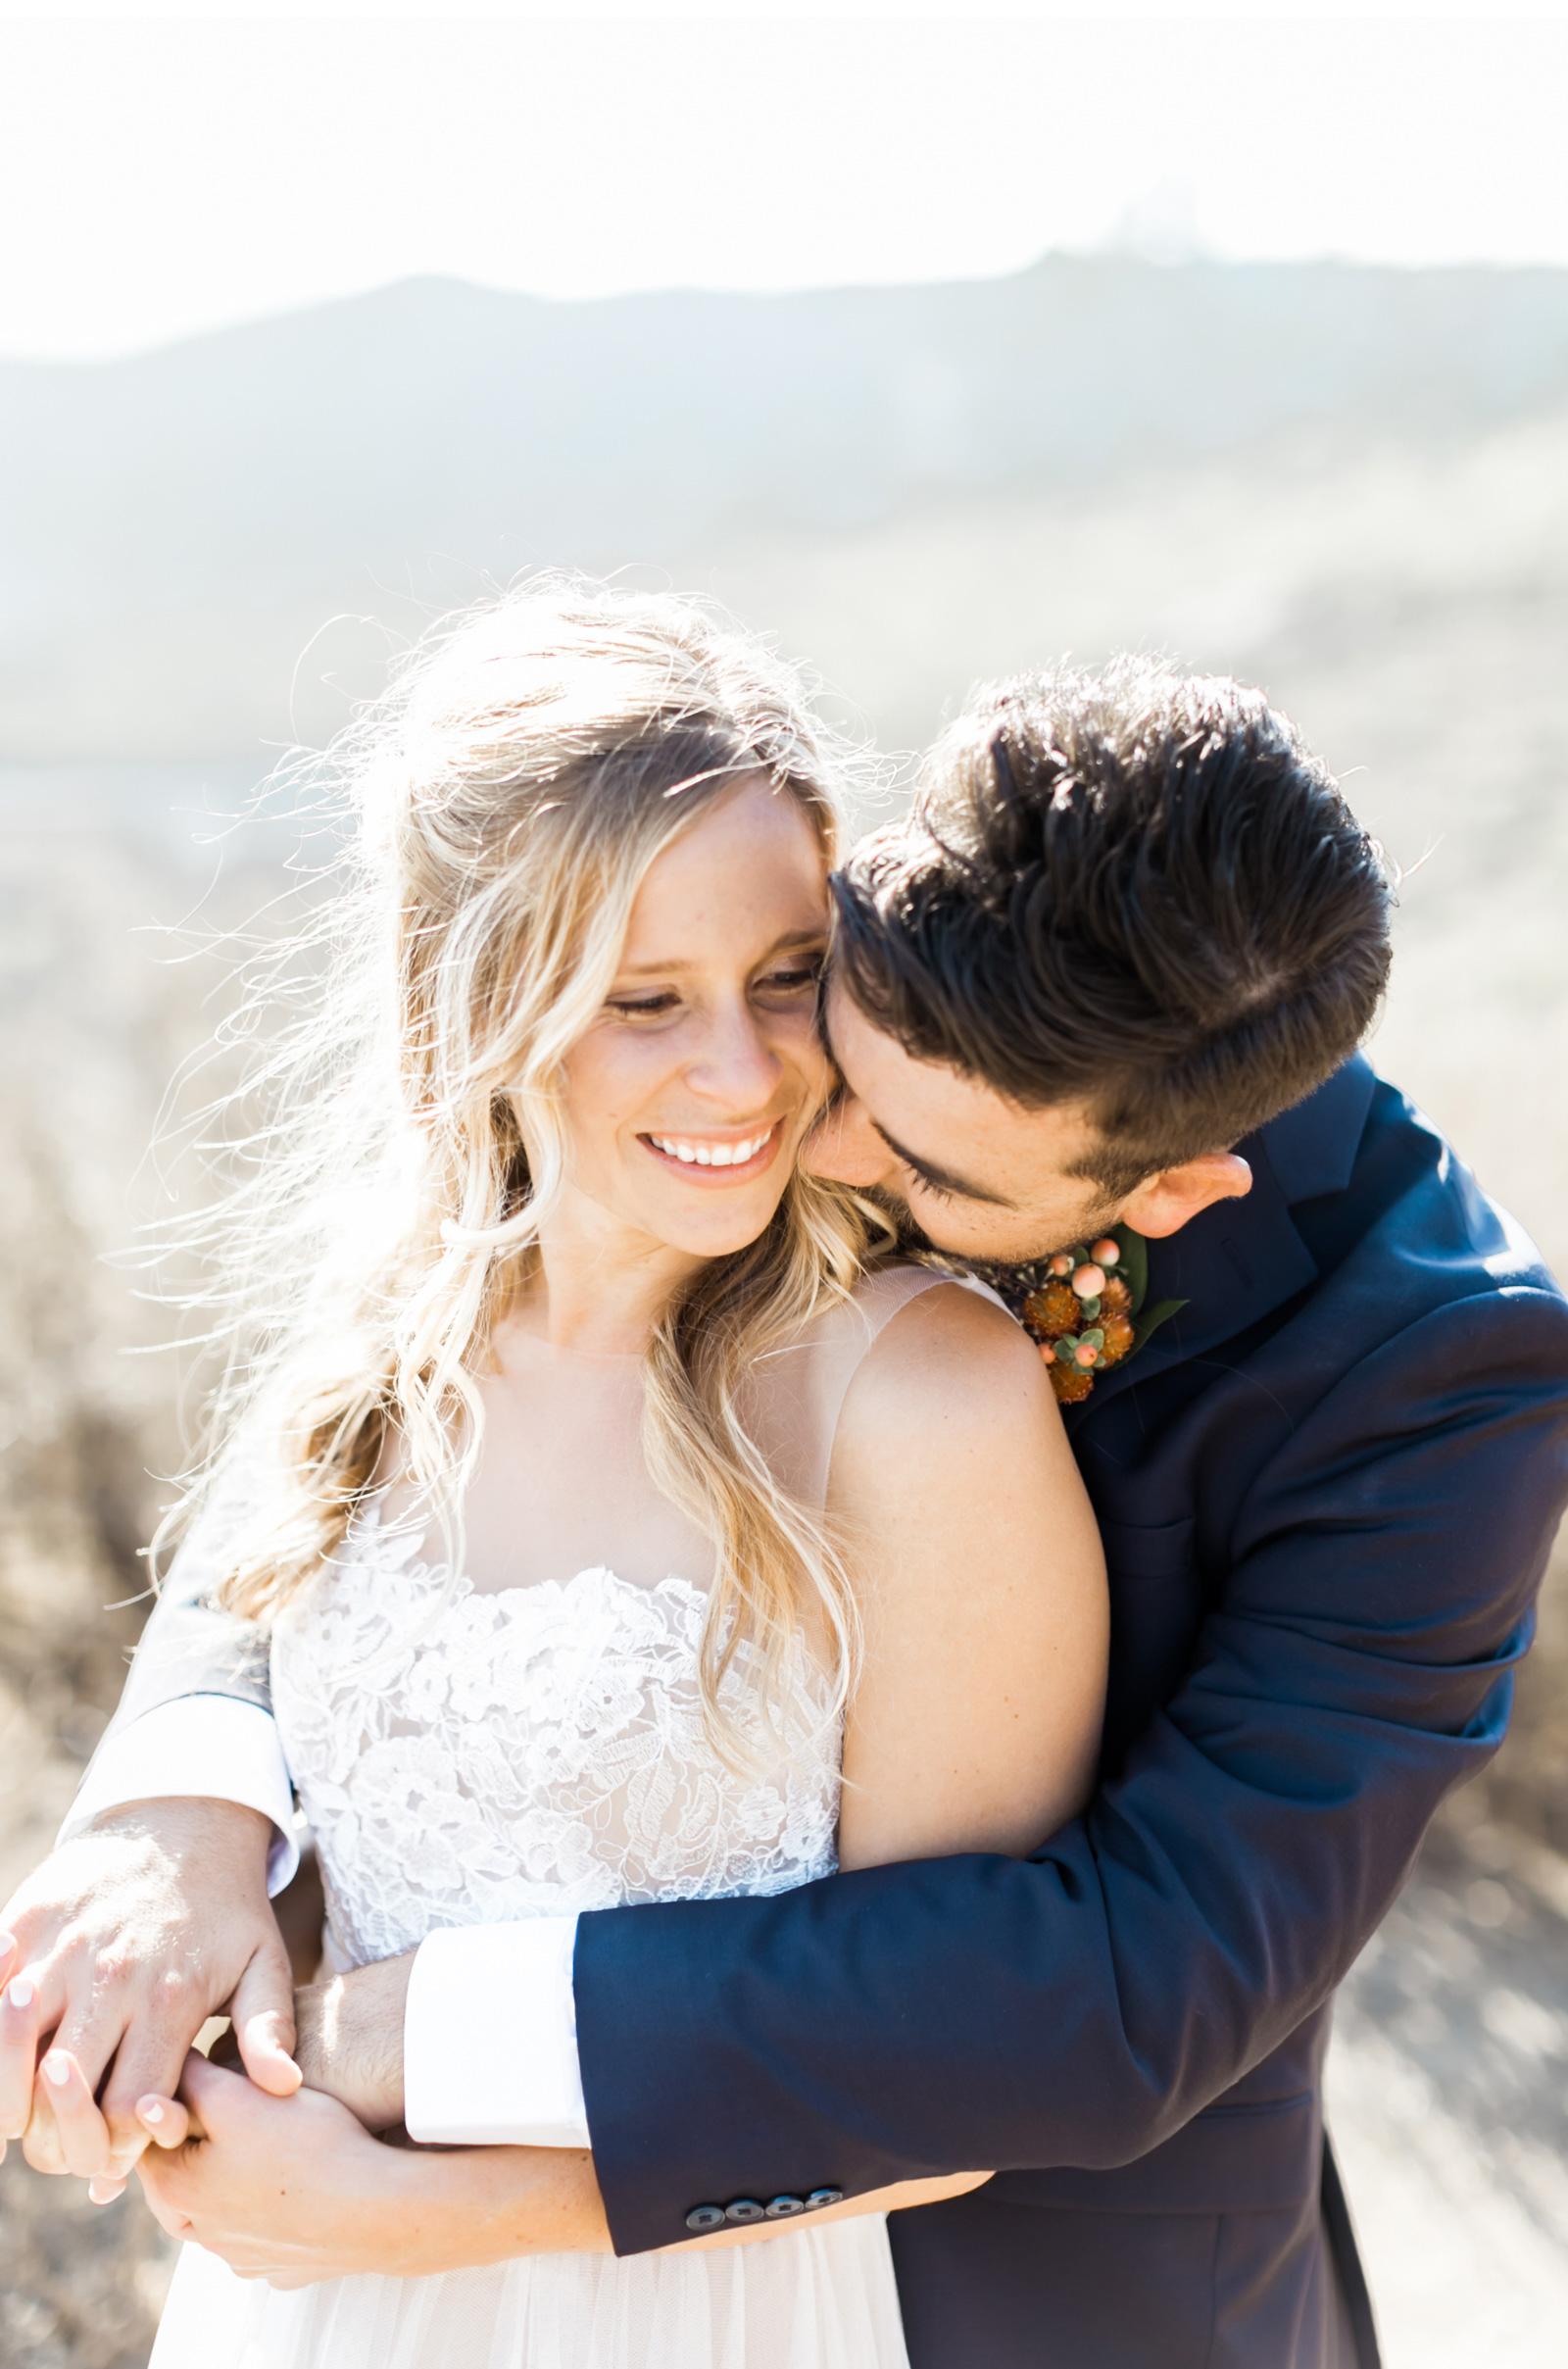 Style-Me-Pretty-San-Luis-Obispo-Wedding-Natalie-Schutt-Photography_02.jpg